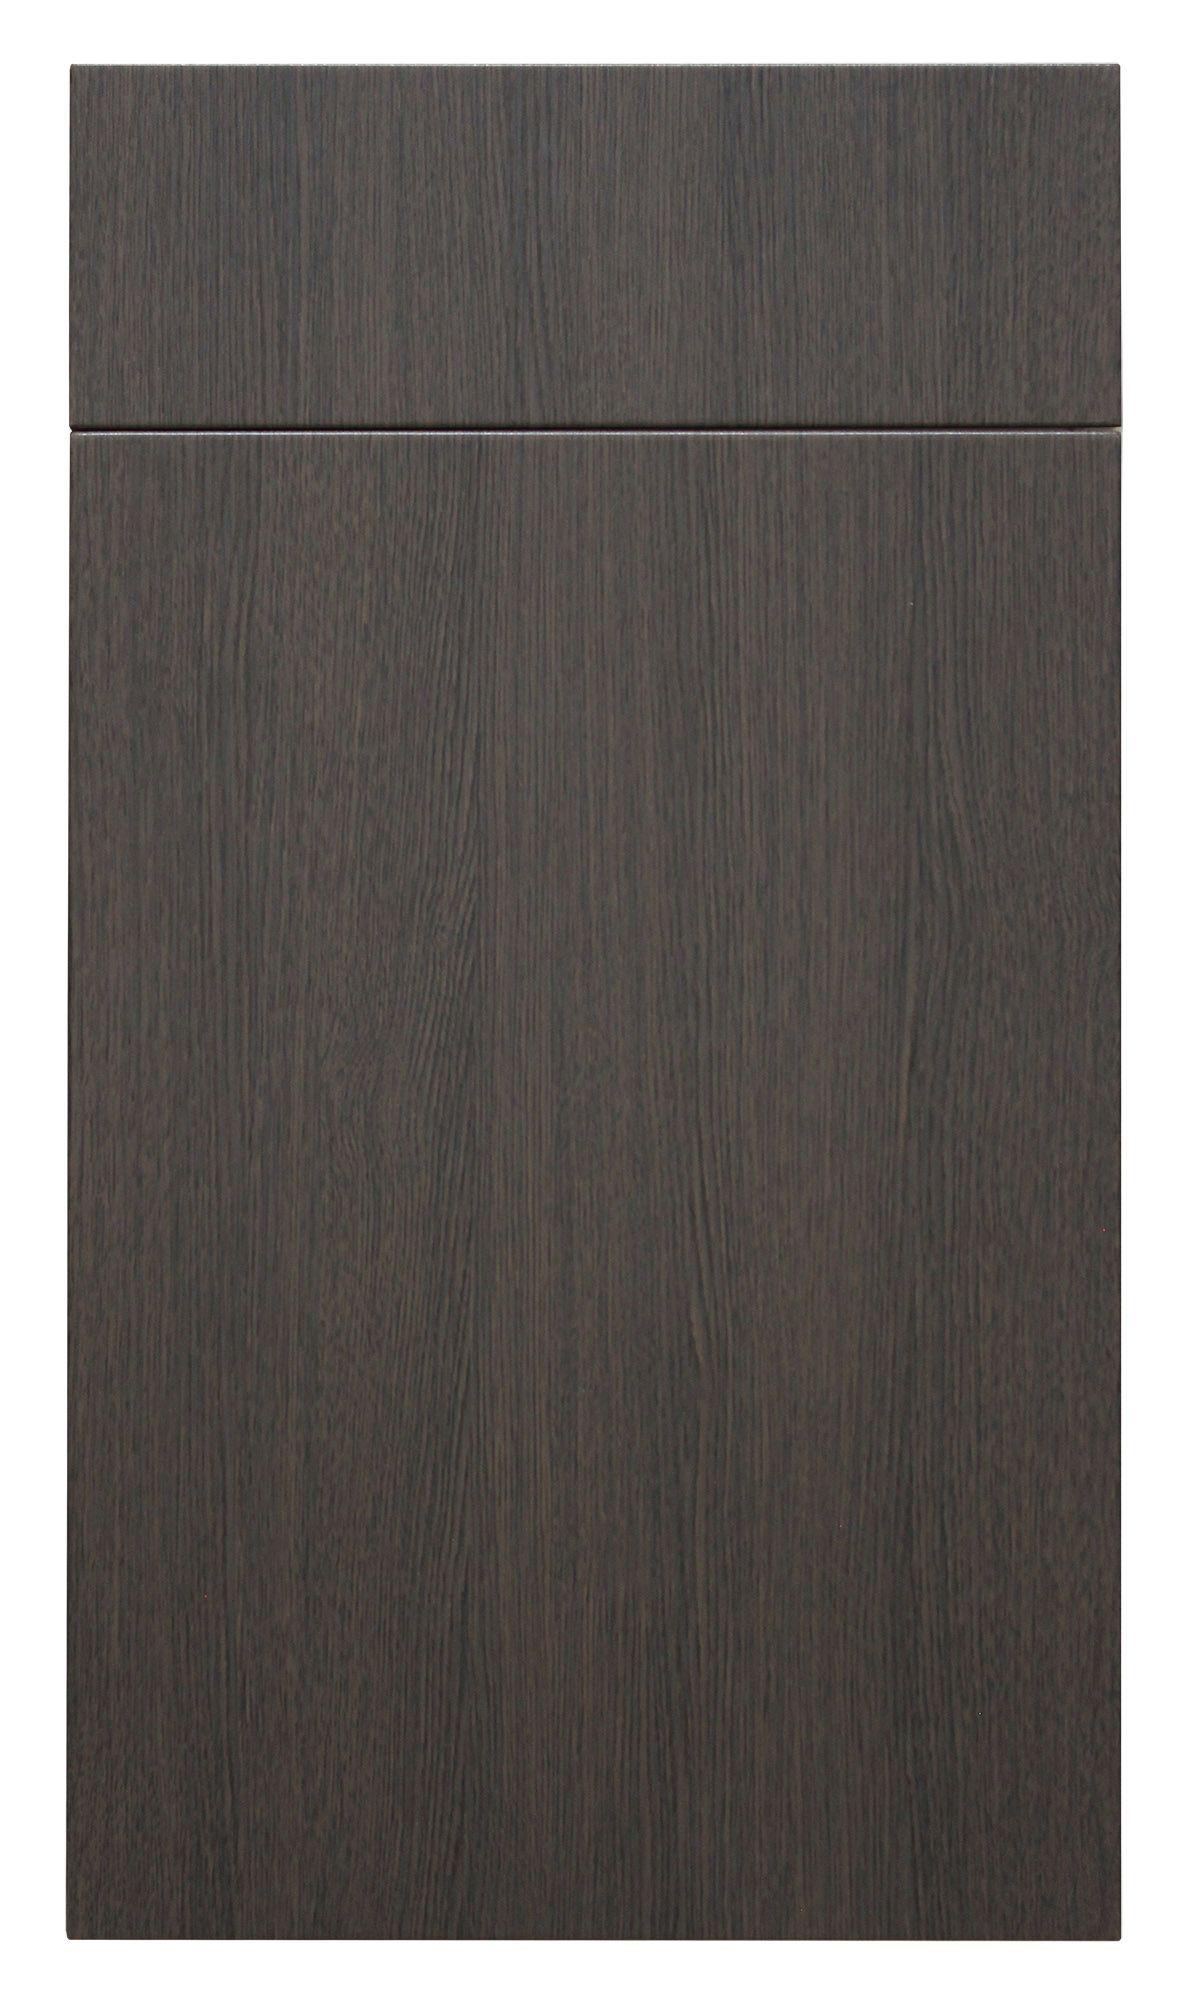 Oak Melinga Grey 2d Sg1009 German Designs Laminate For Kitchen